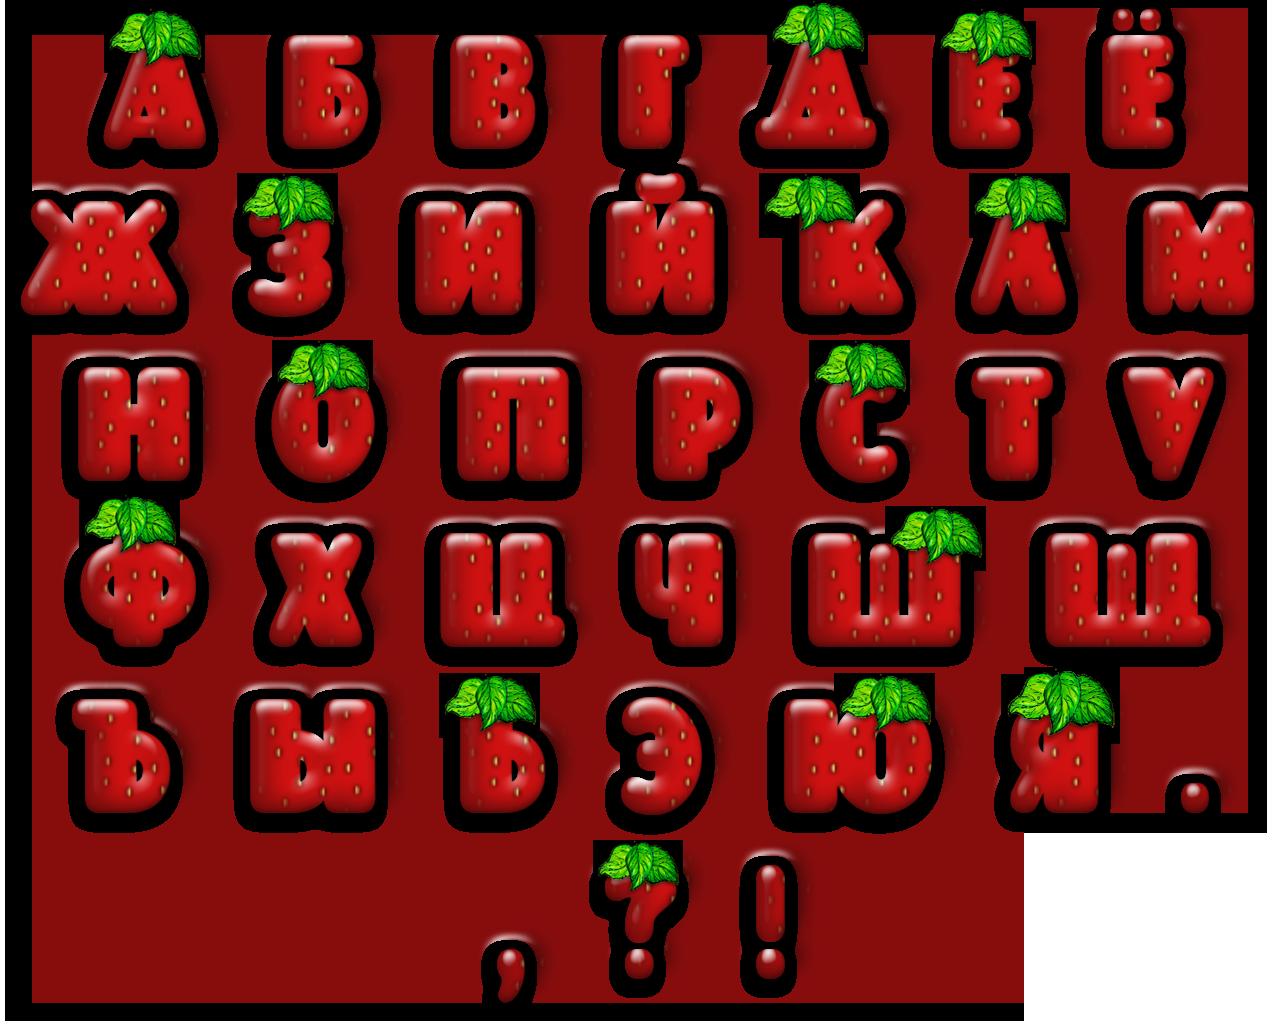 картинки векторного алфавита